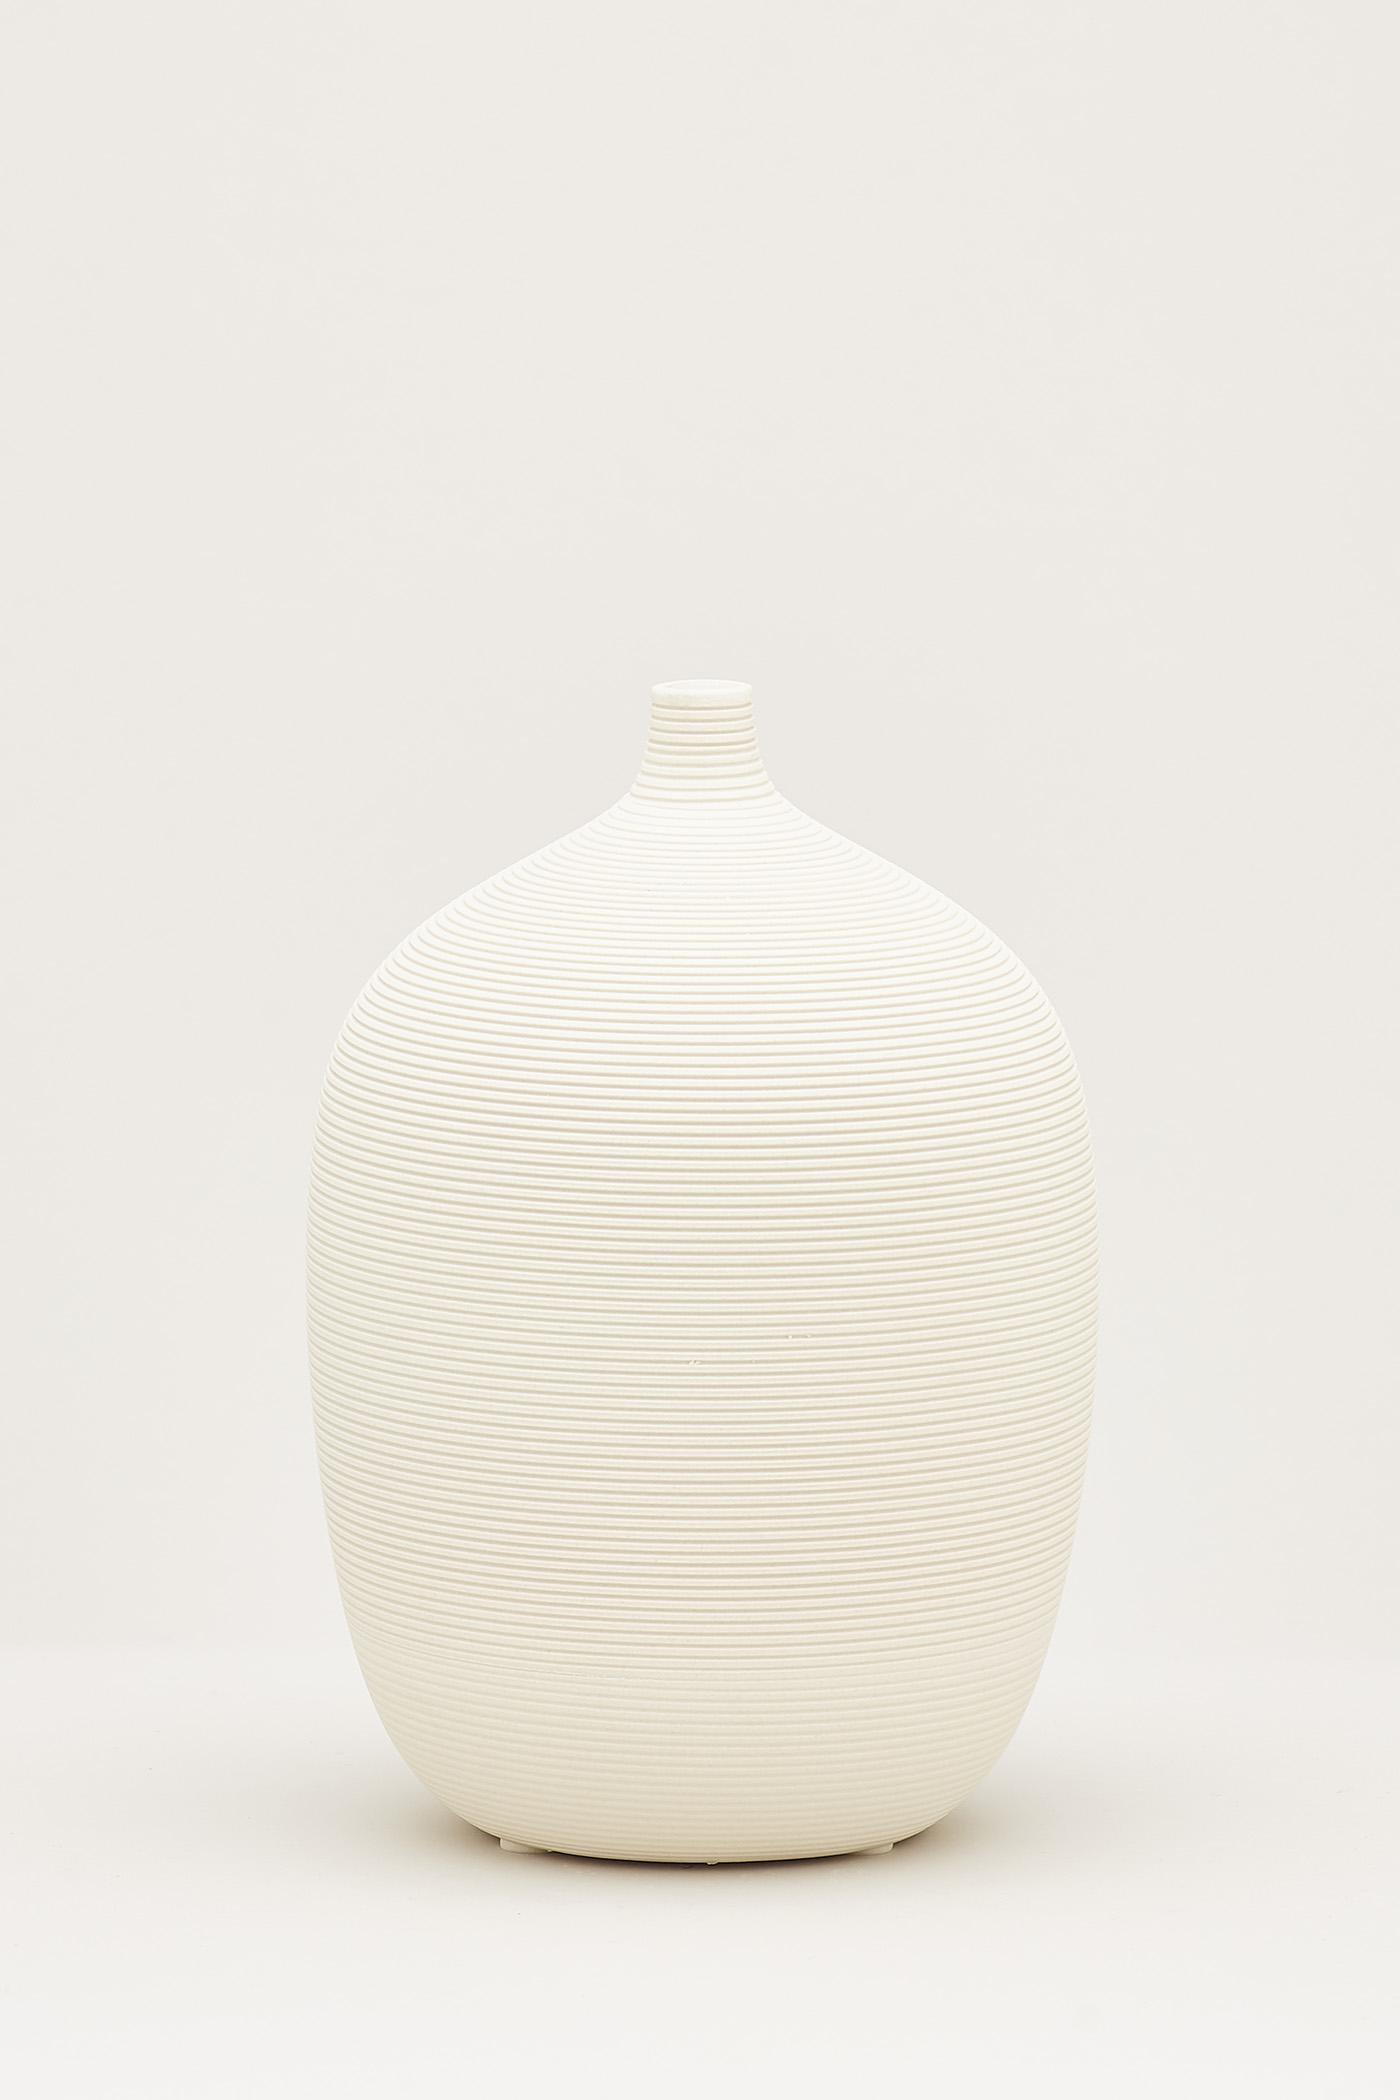 Kanaye Rigged Large Vase